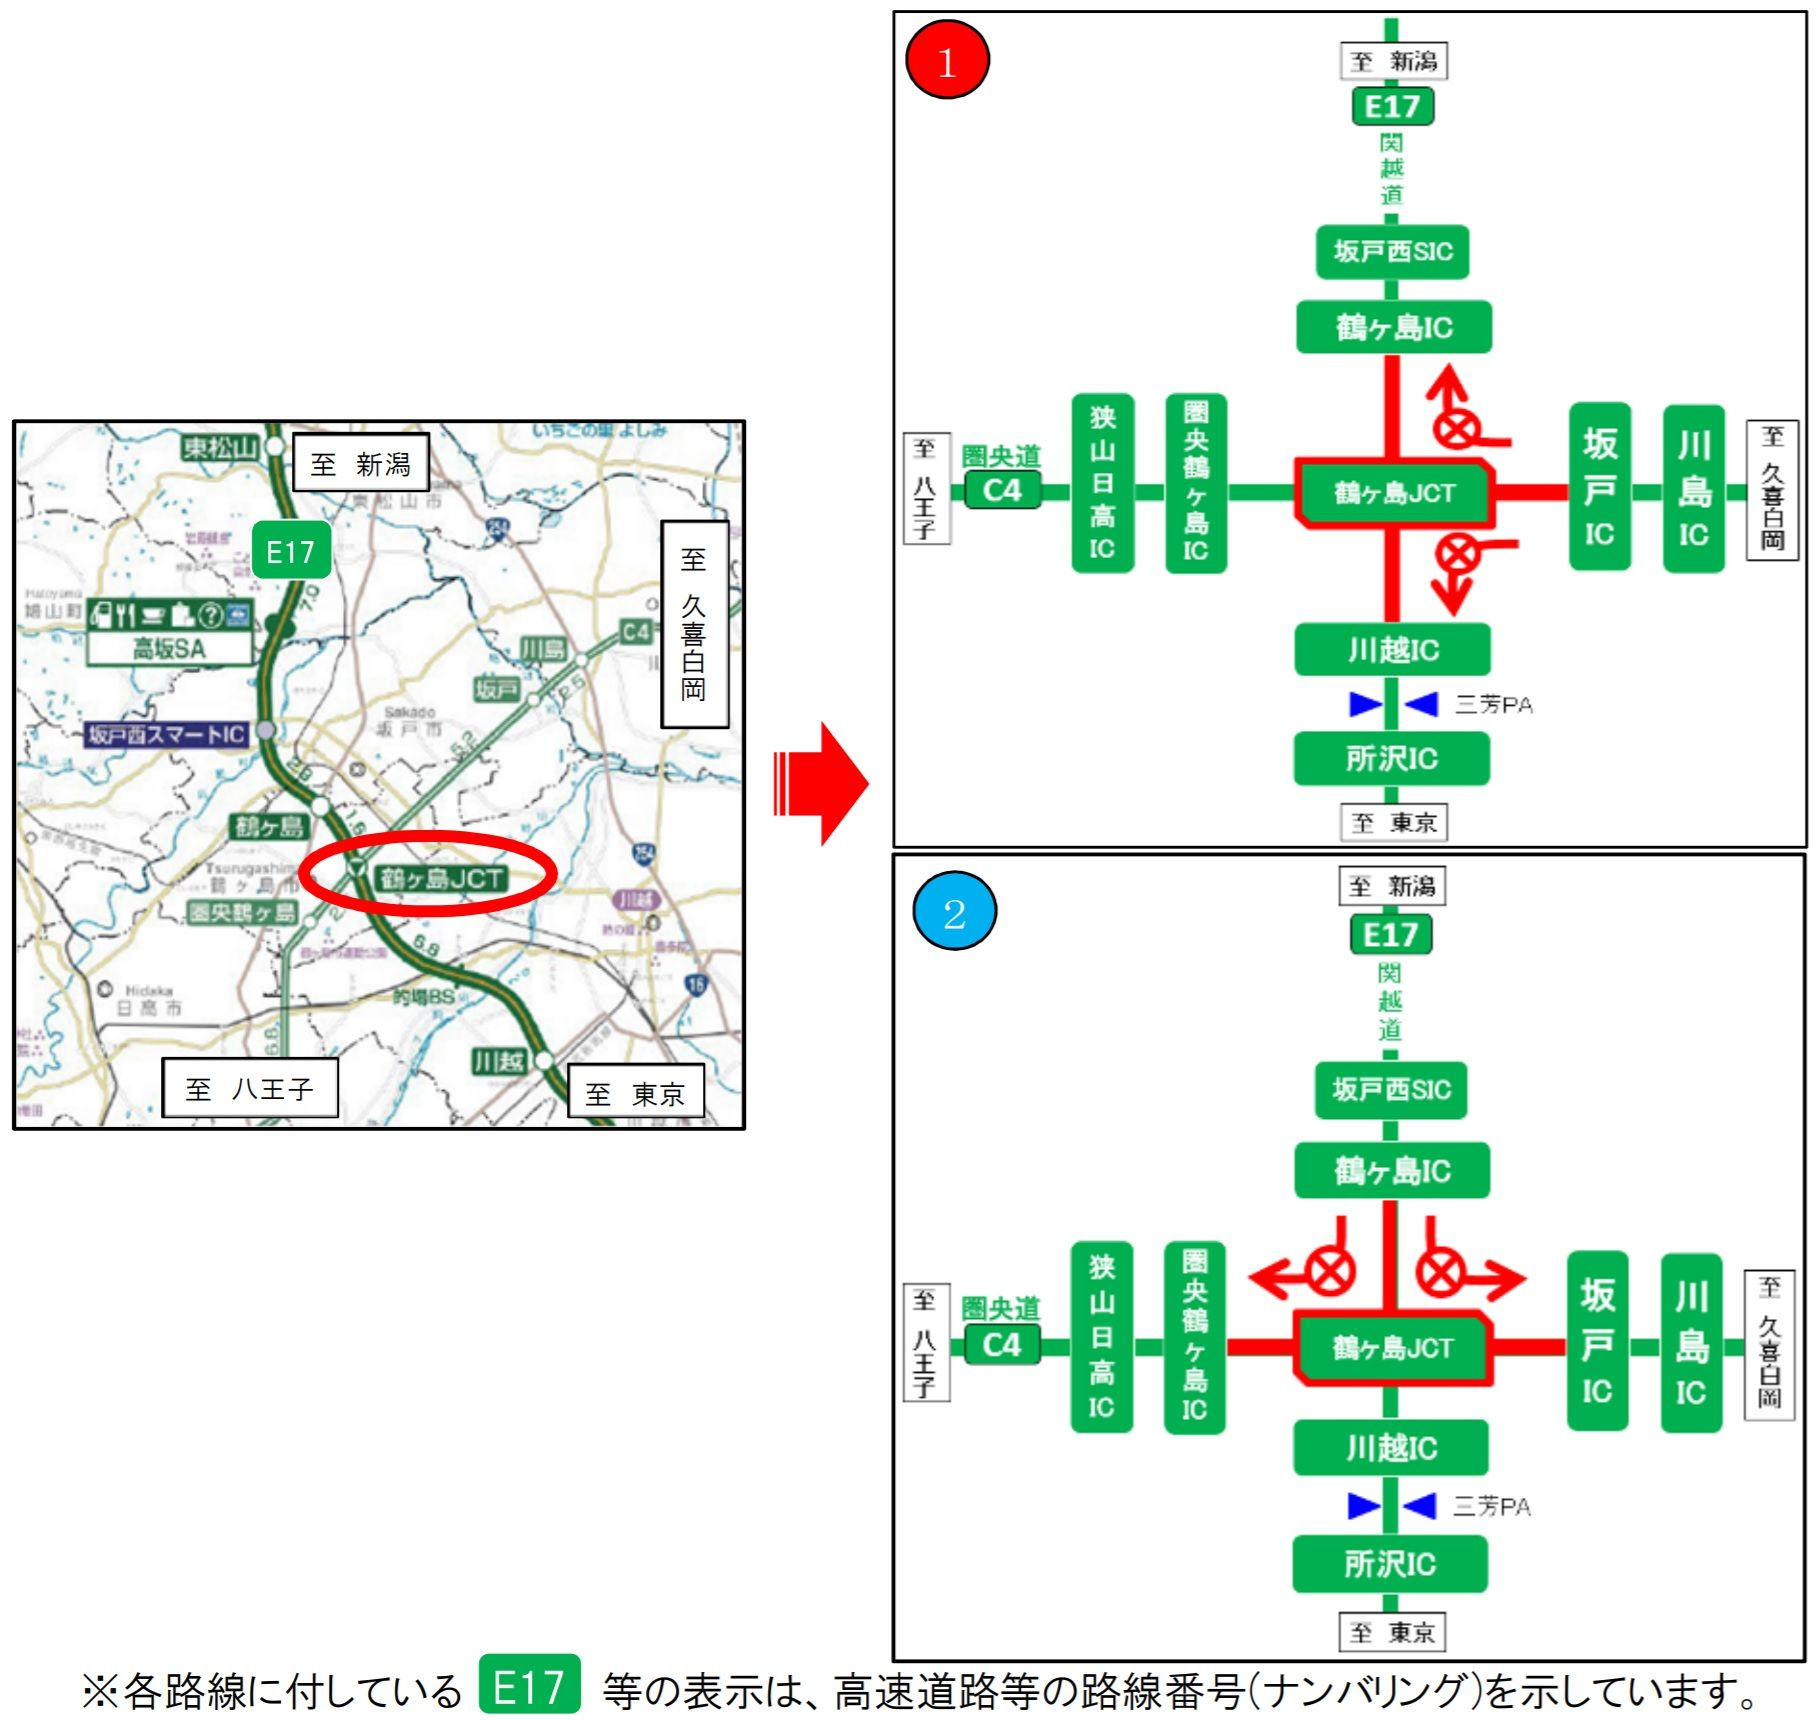 Watch Headline: NEXCO東日本関越道圏央道の鶴ヶ島JCTで夜間ランプ閉鎖